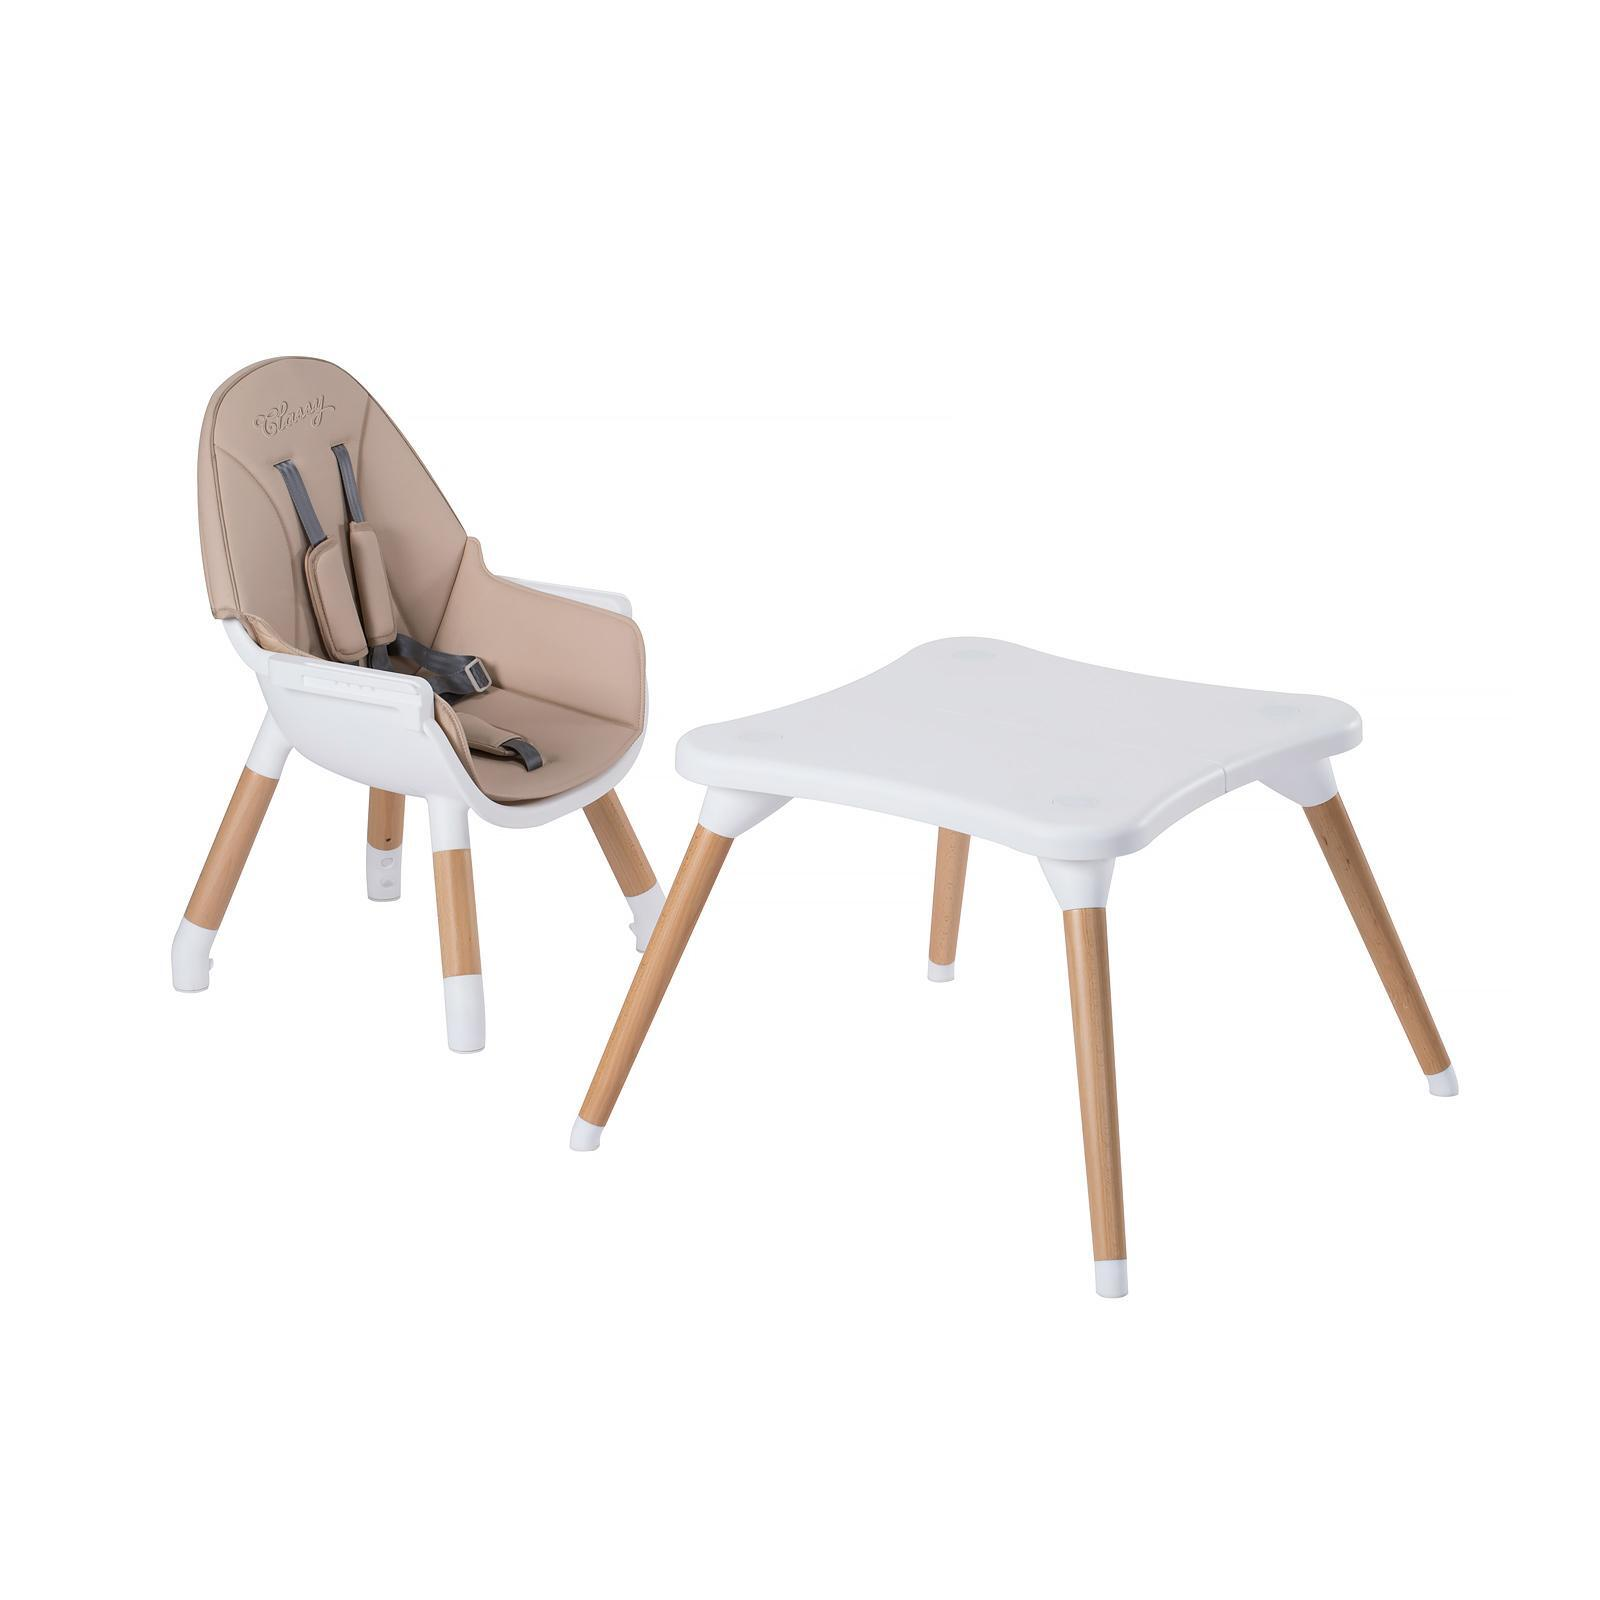 "Chipolino Стол за хранене 3 в 1 ""Classy"" лате"